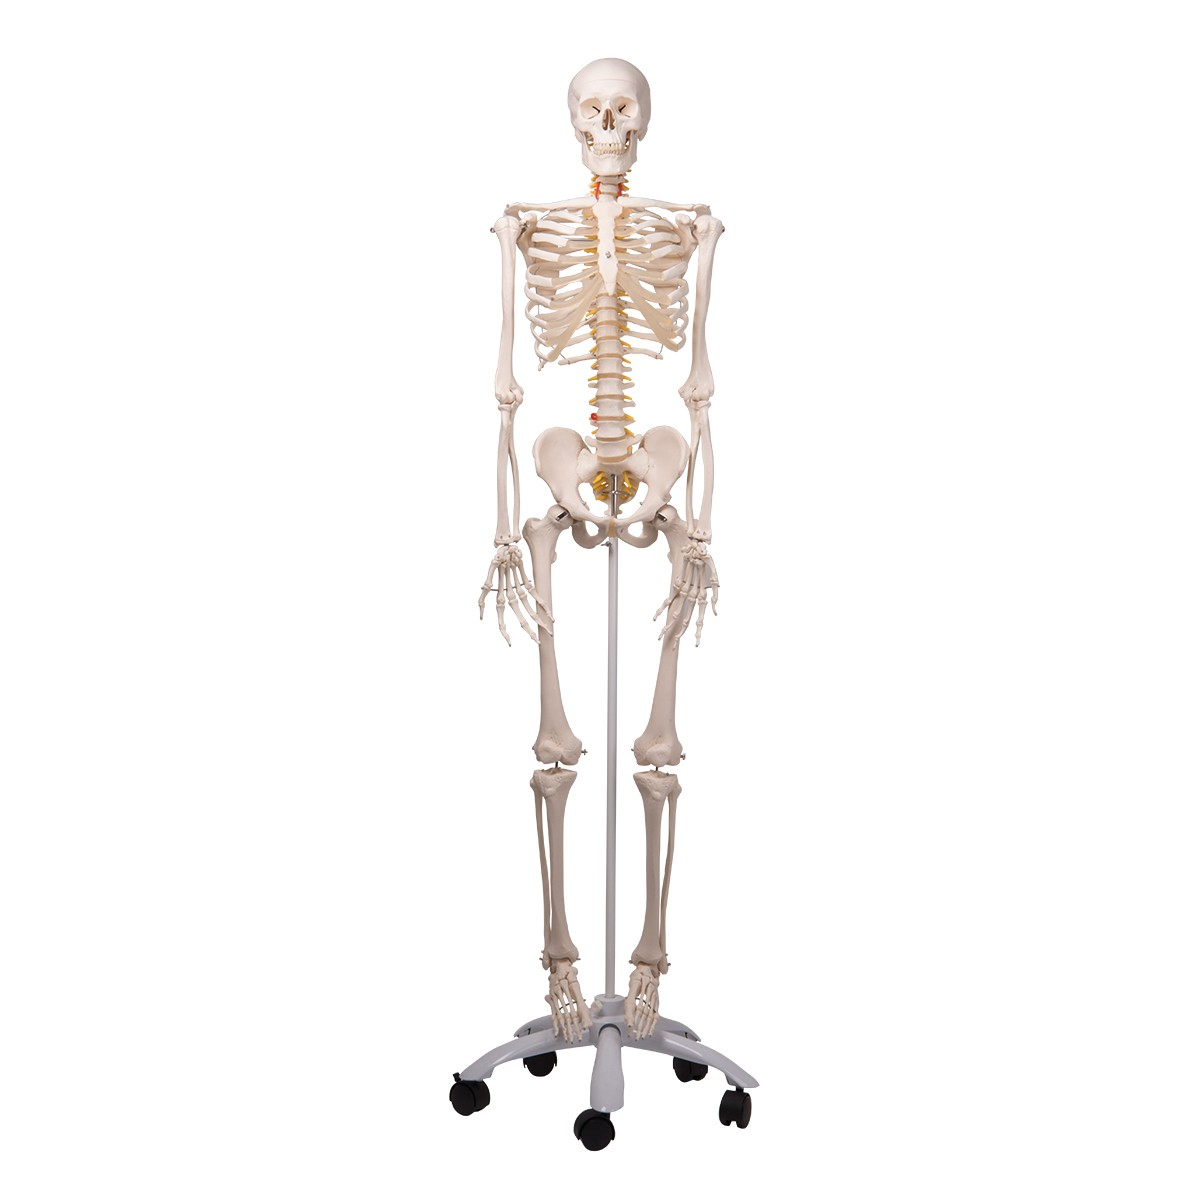 Skelett Modell Fred, Luxus Skelett auf 5-Fuß-Rollenstativ